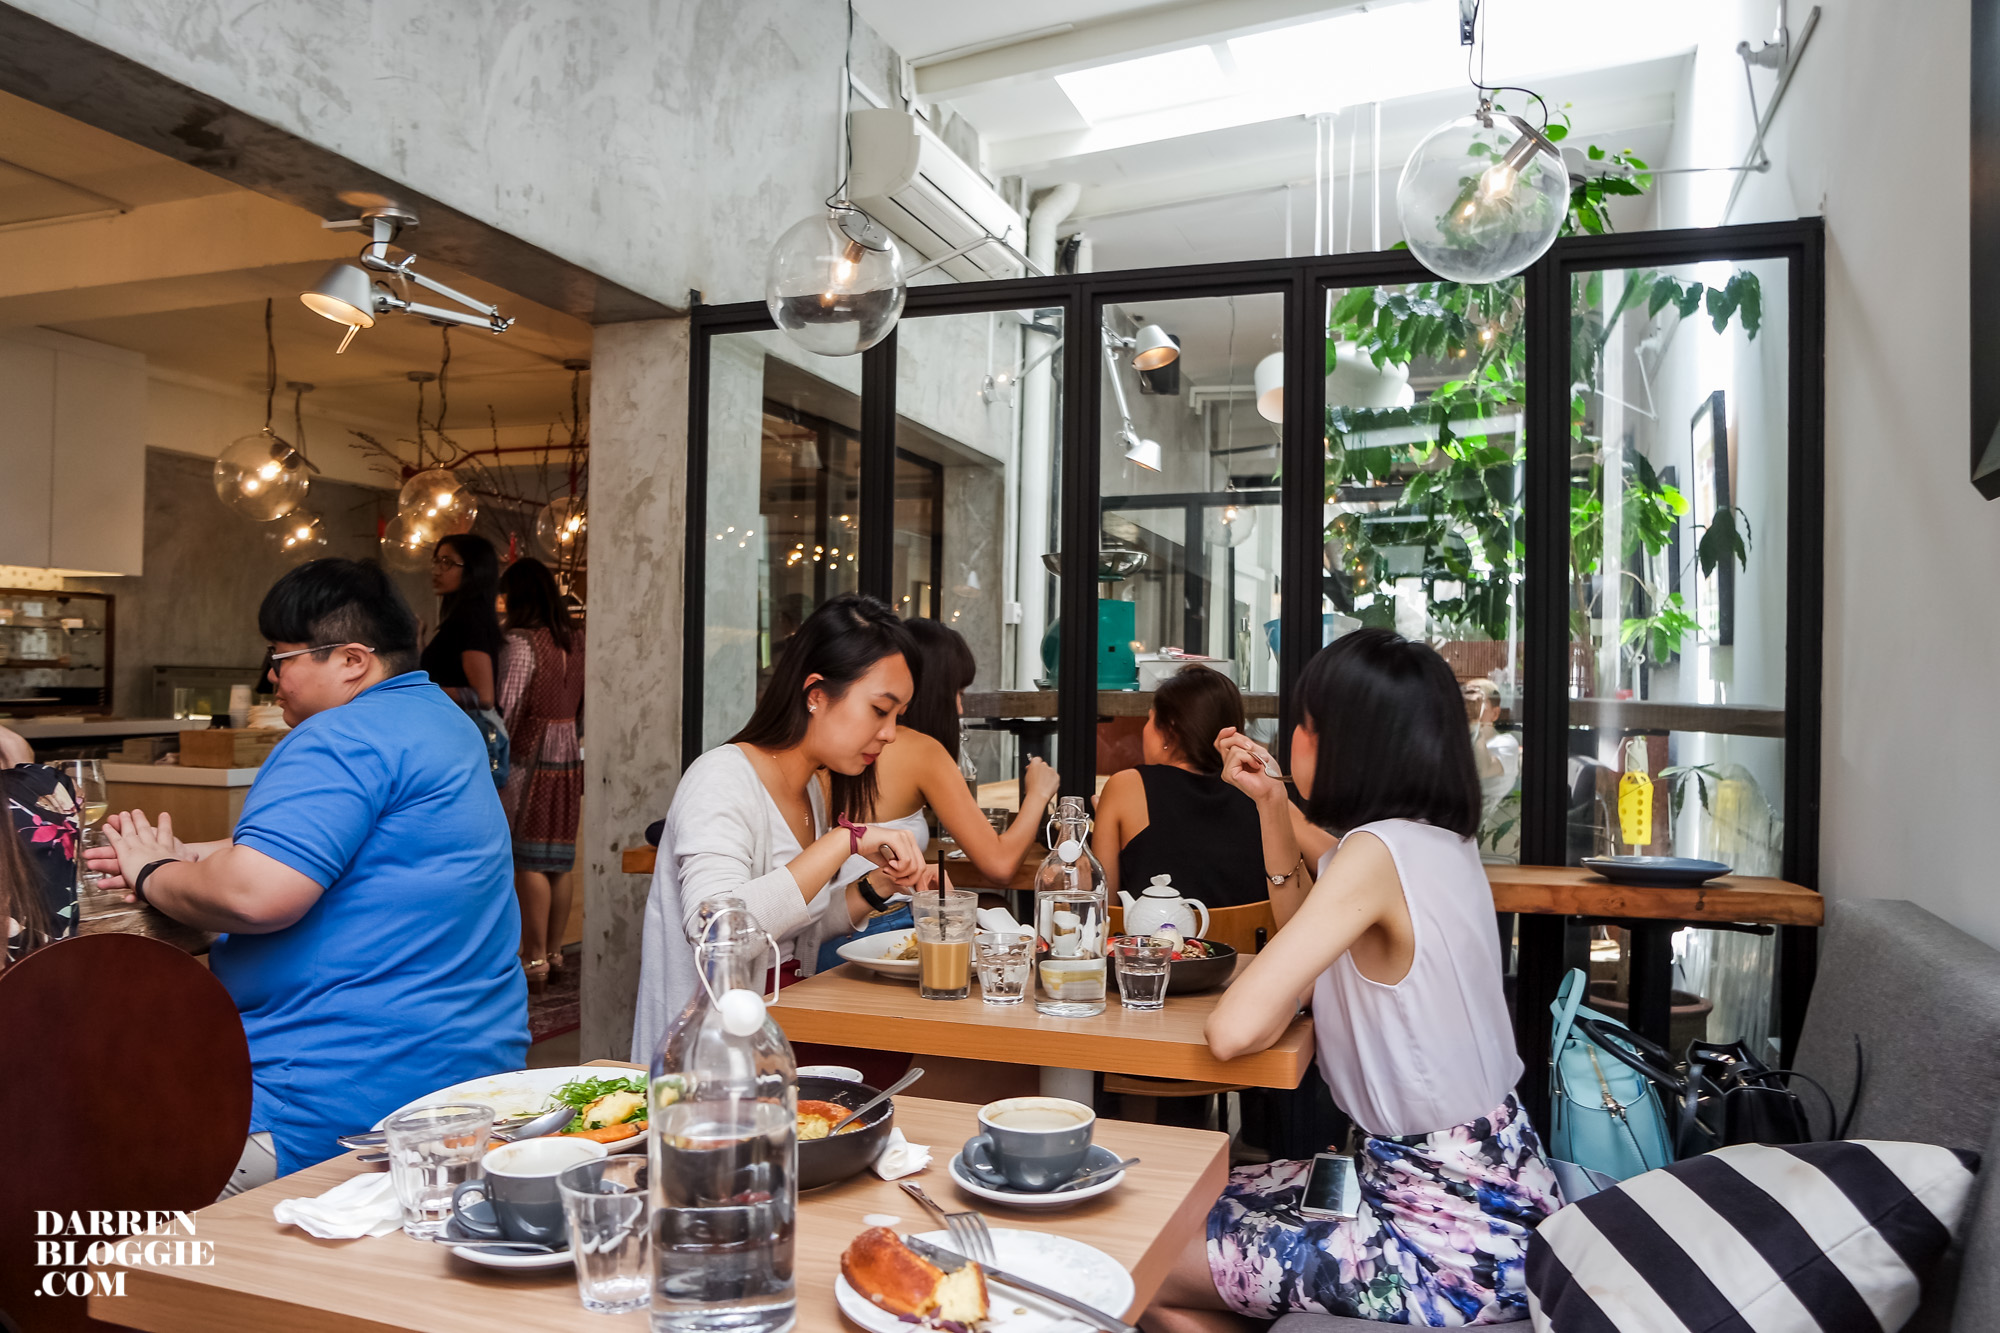 curious-palatte-cafe-singapore-4284